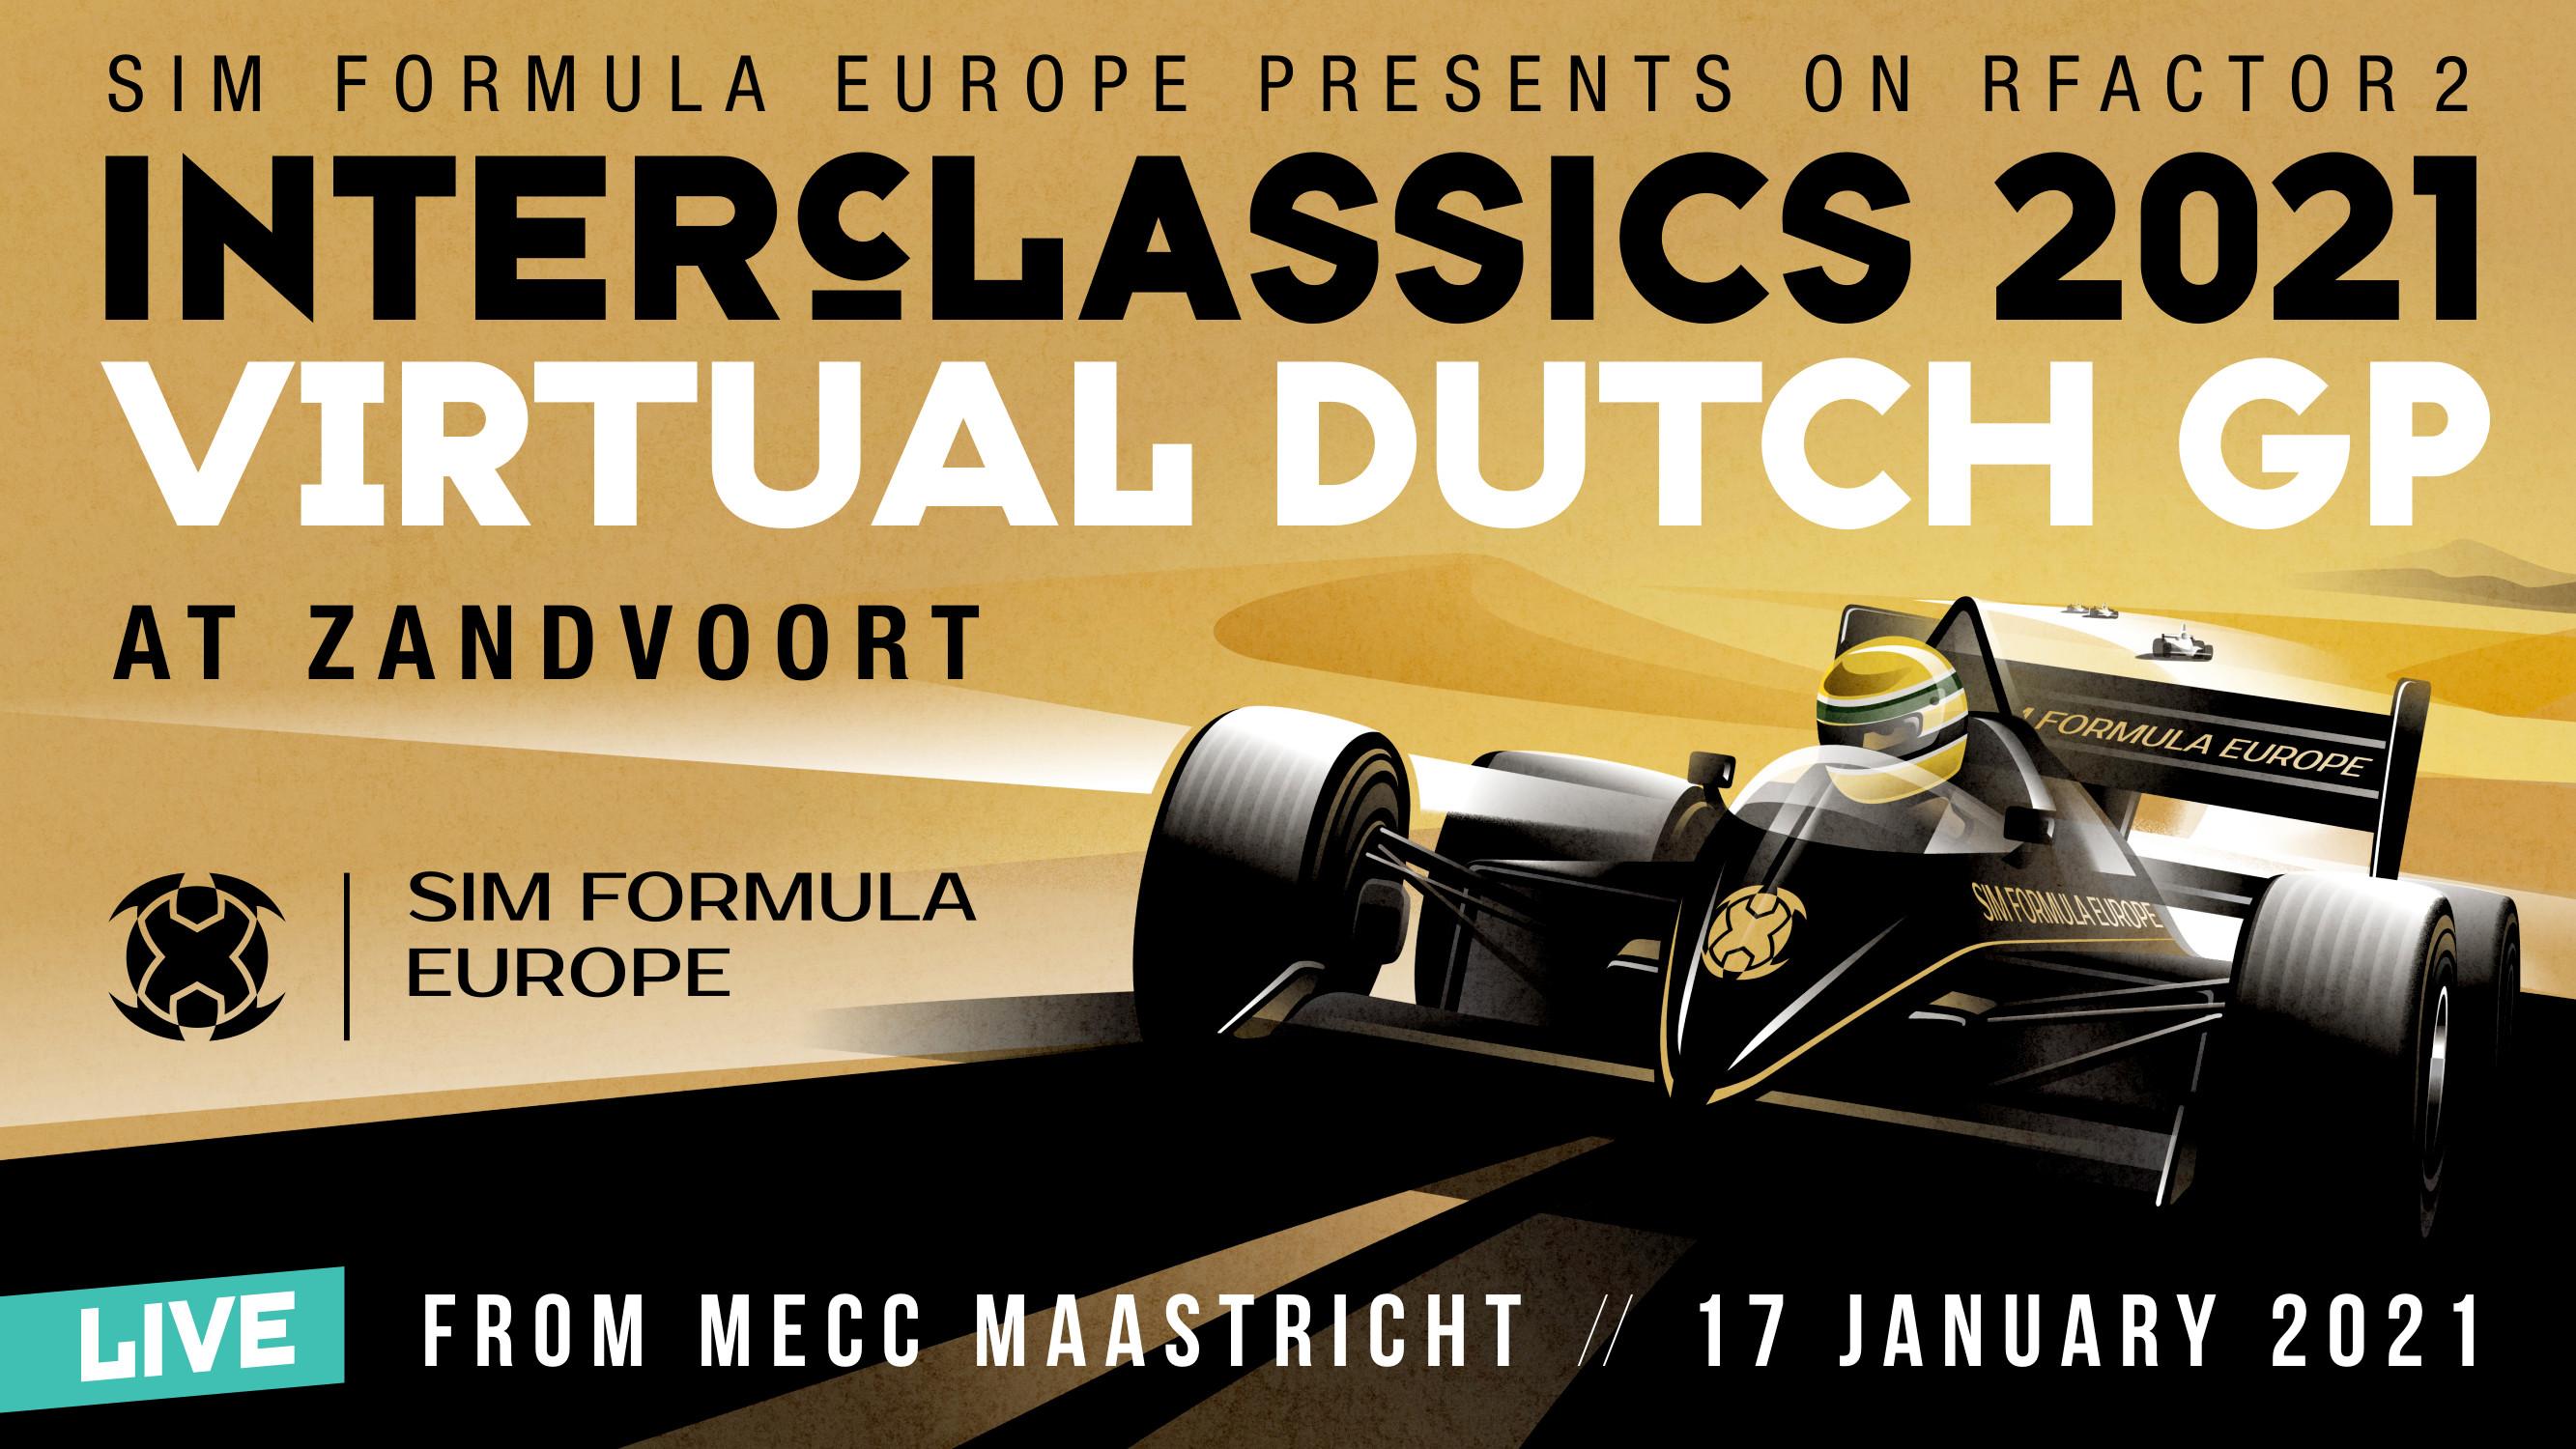 OFFICIAL POSTER - ICM 2021 SIM Formula Europe visual 1920x1080 1120 v1.jpg